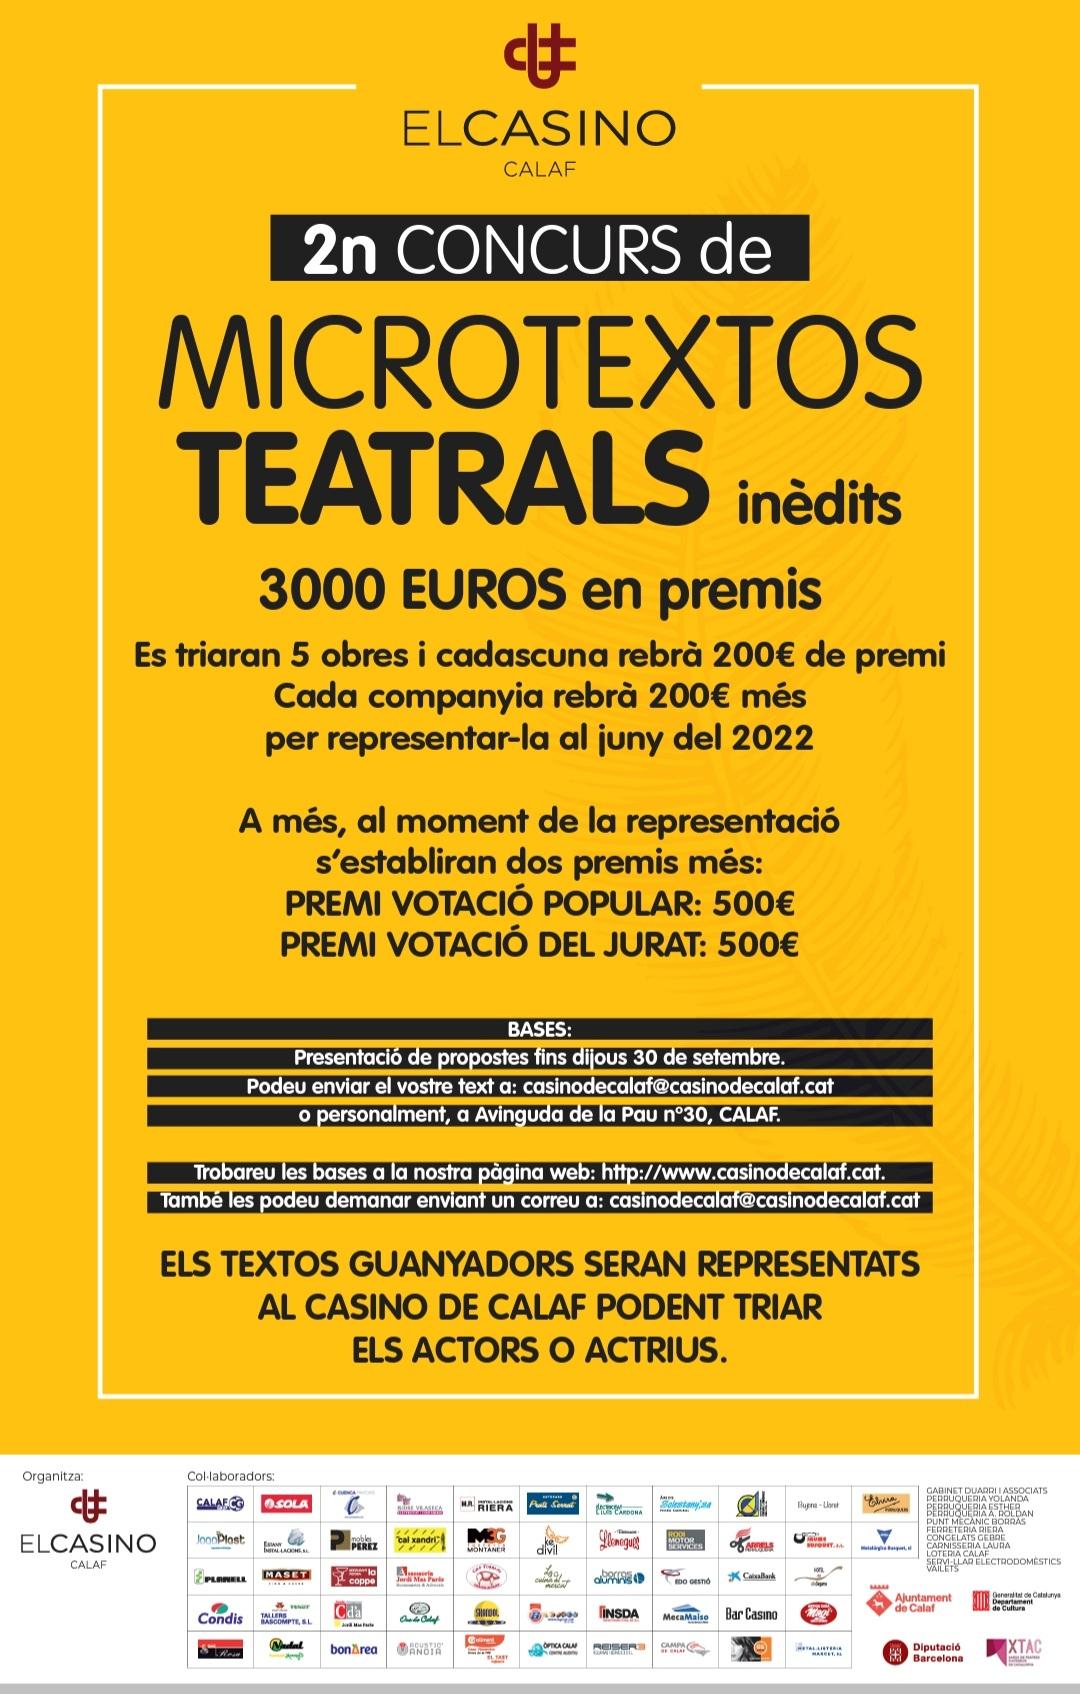 2N MICROTEXTOS TEATRALS